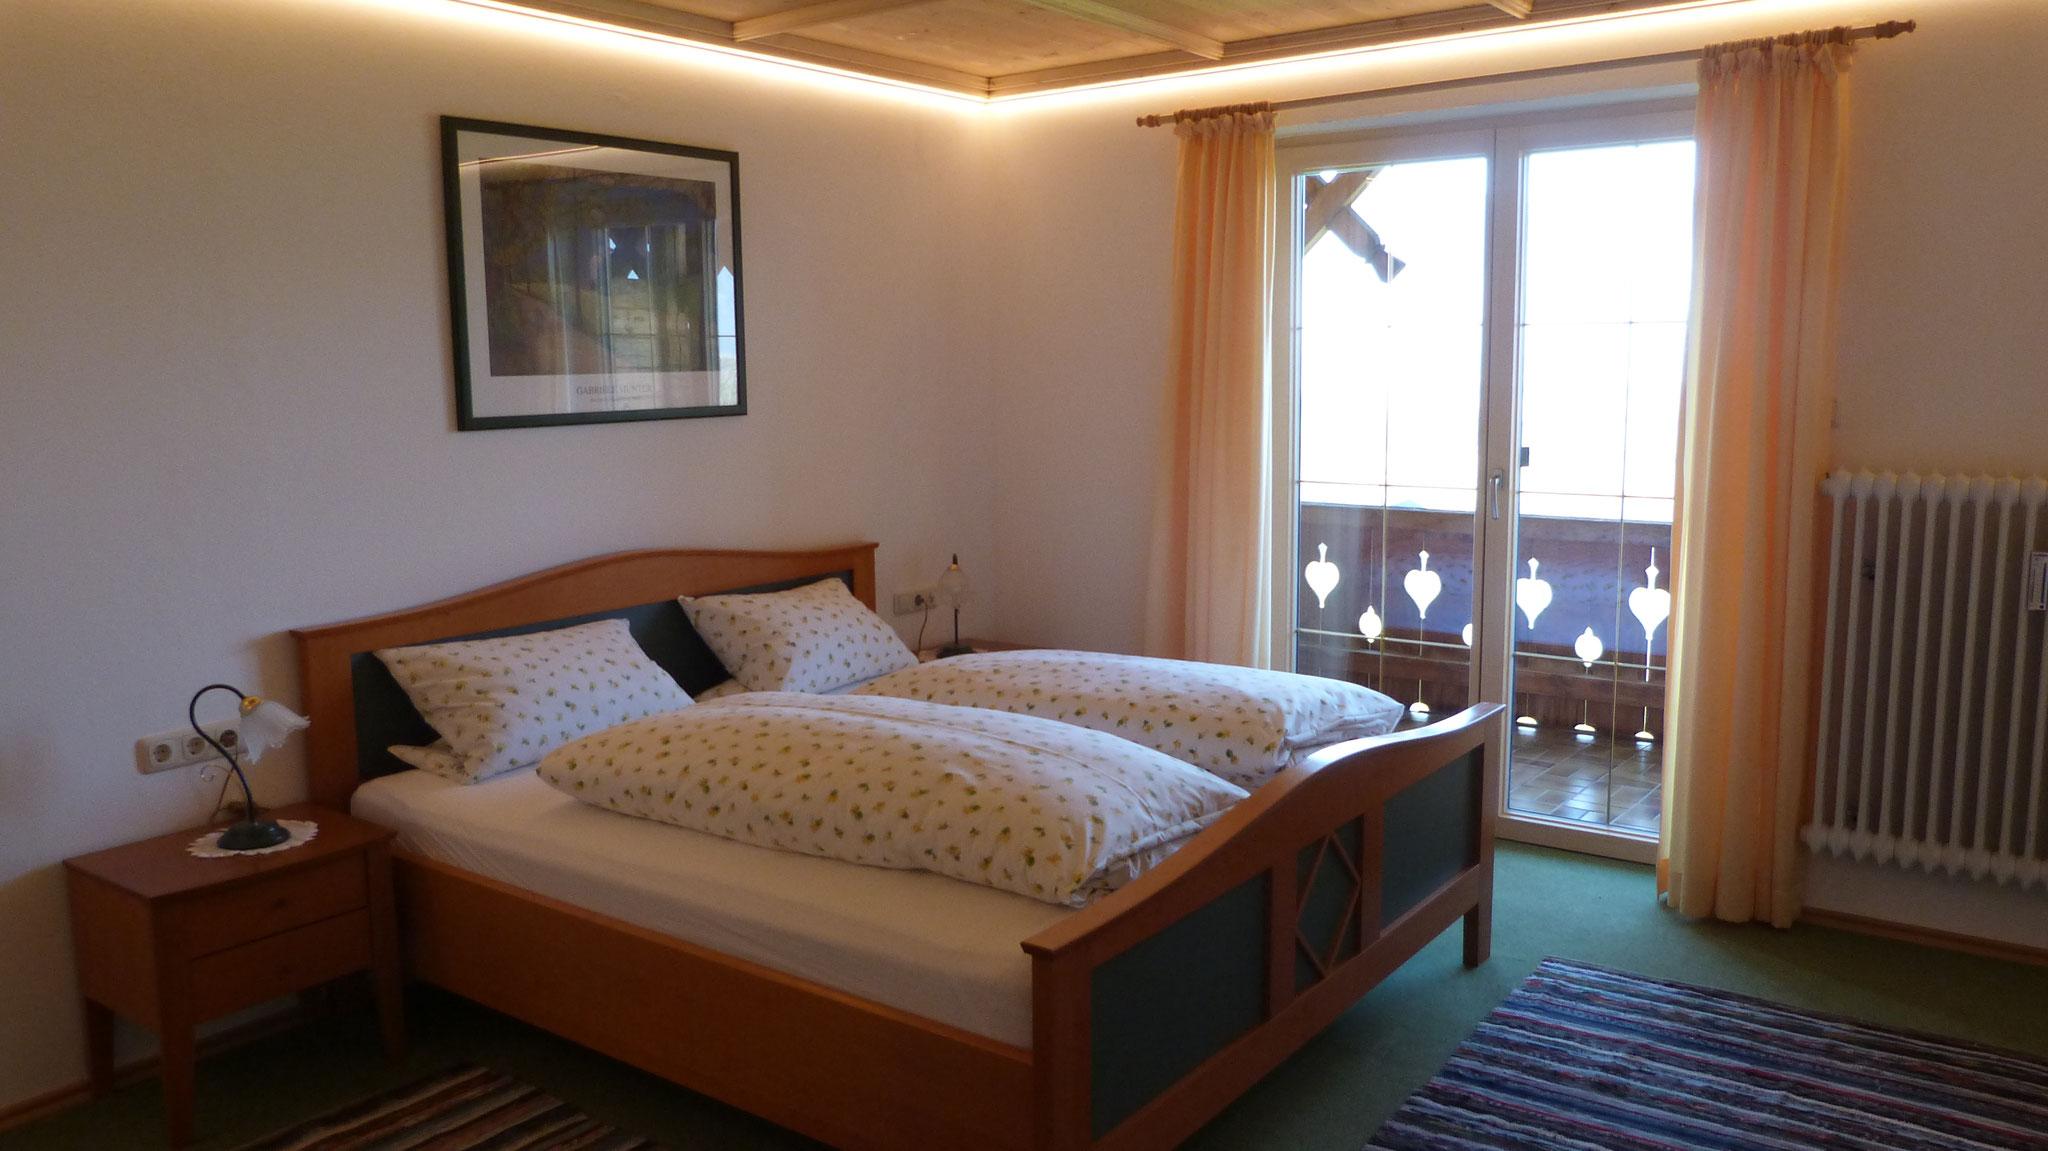 Riesiges Schlafzimmer mit Panoramablick